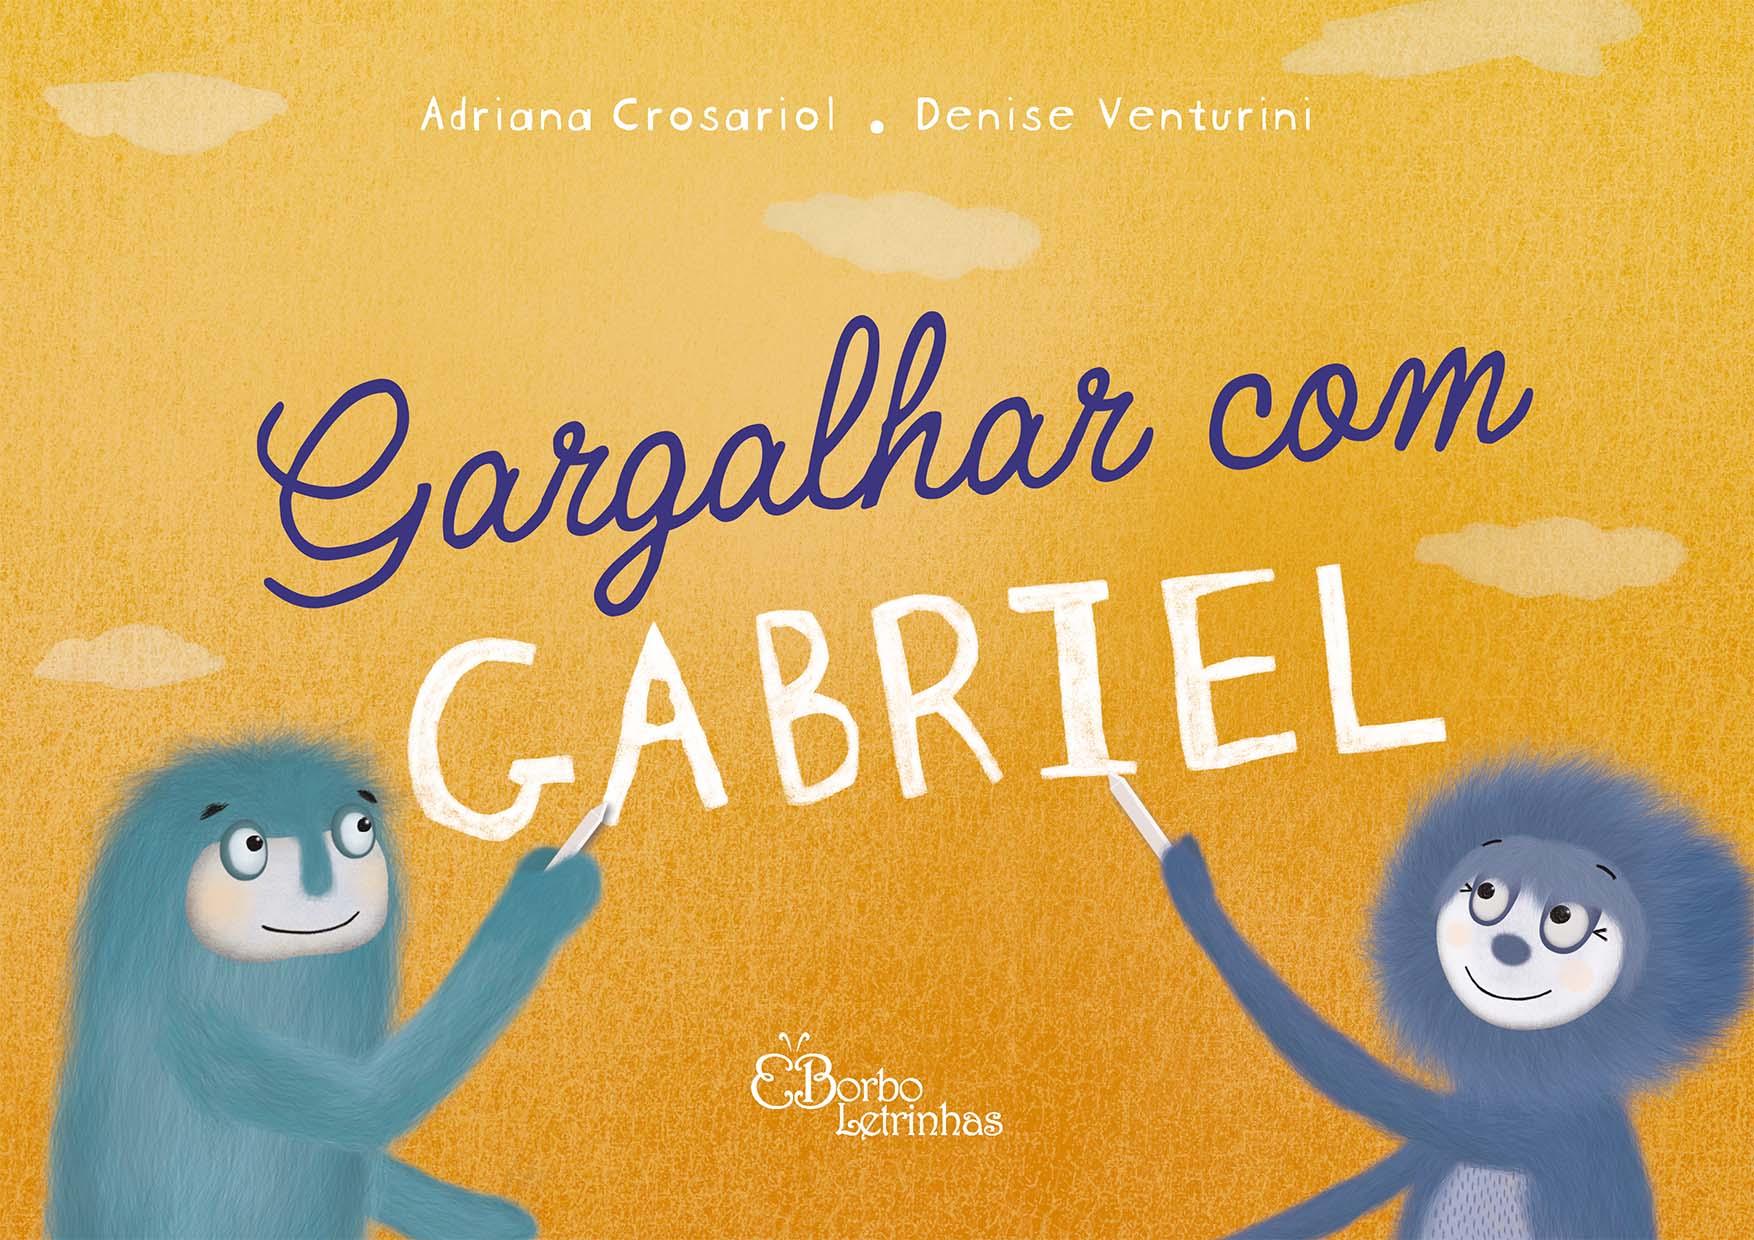 Gargalhar com Gabriel